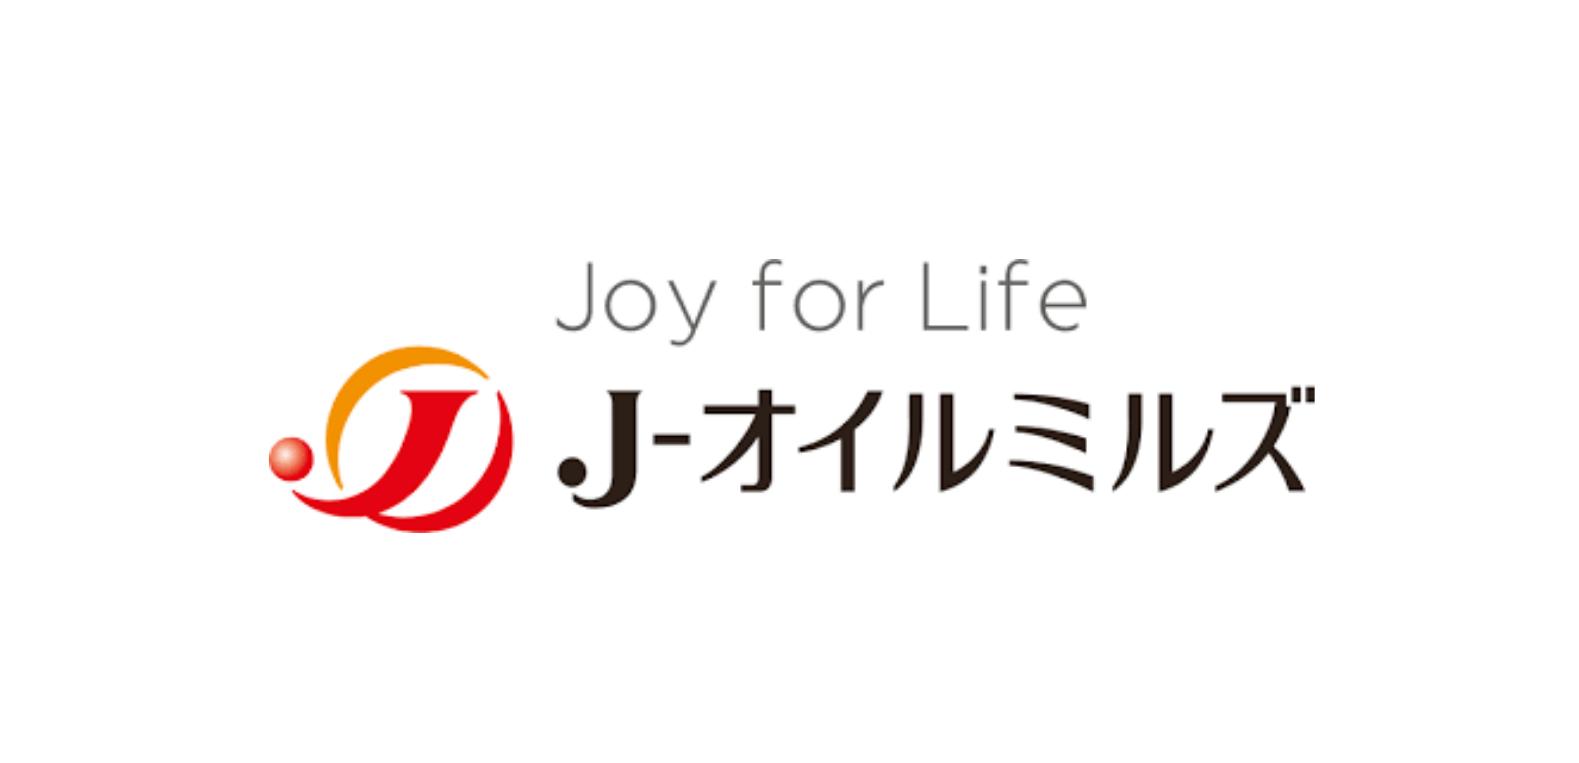 Jオイルミルズのロゴ